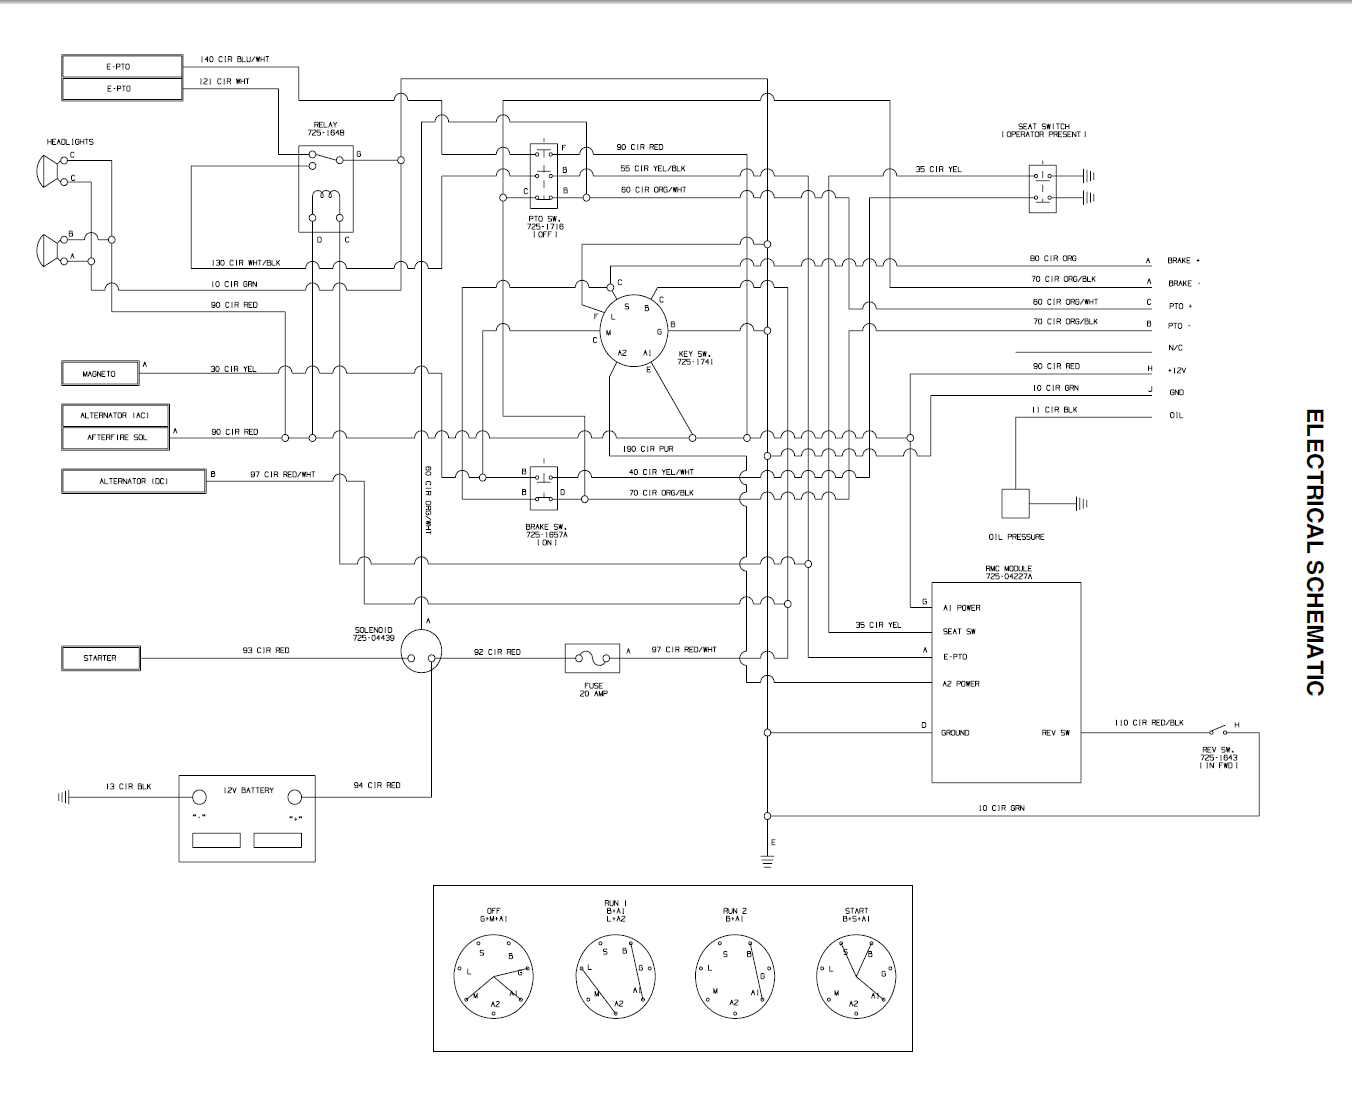 Dodge Grand Caravan Wiring Diagram 5sh7g Air Compressor Makita Mac2400 Hitachi Ec12 Free Online Website Malware Scanner Security Monitoring Rh Quttera Com